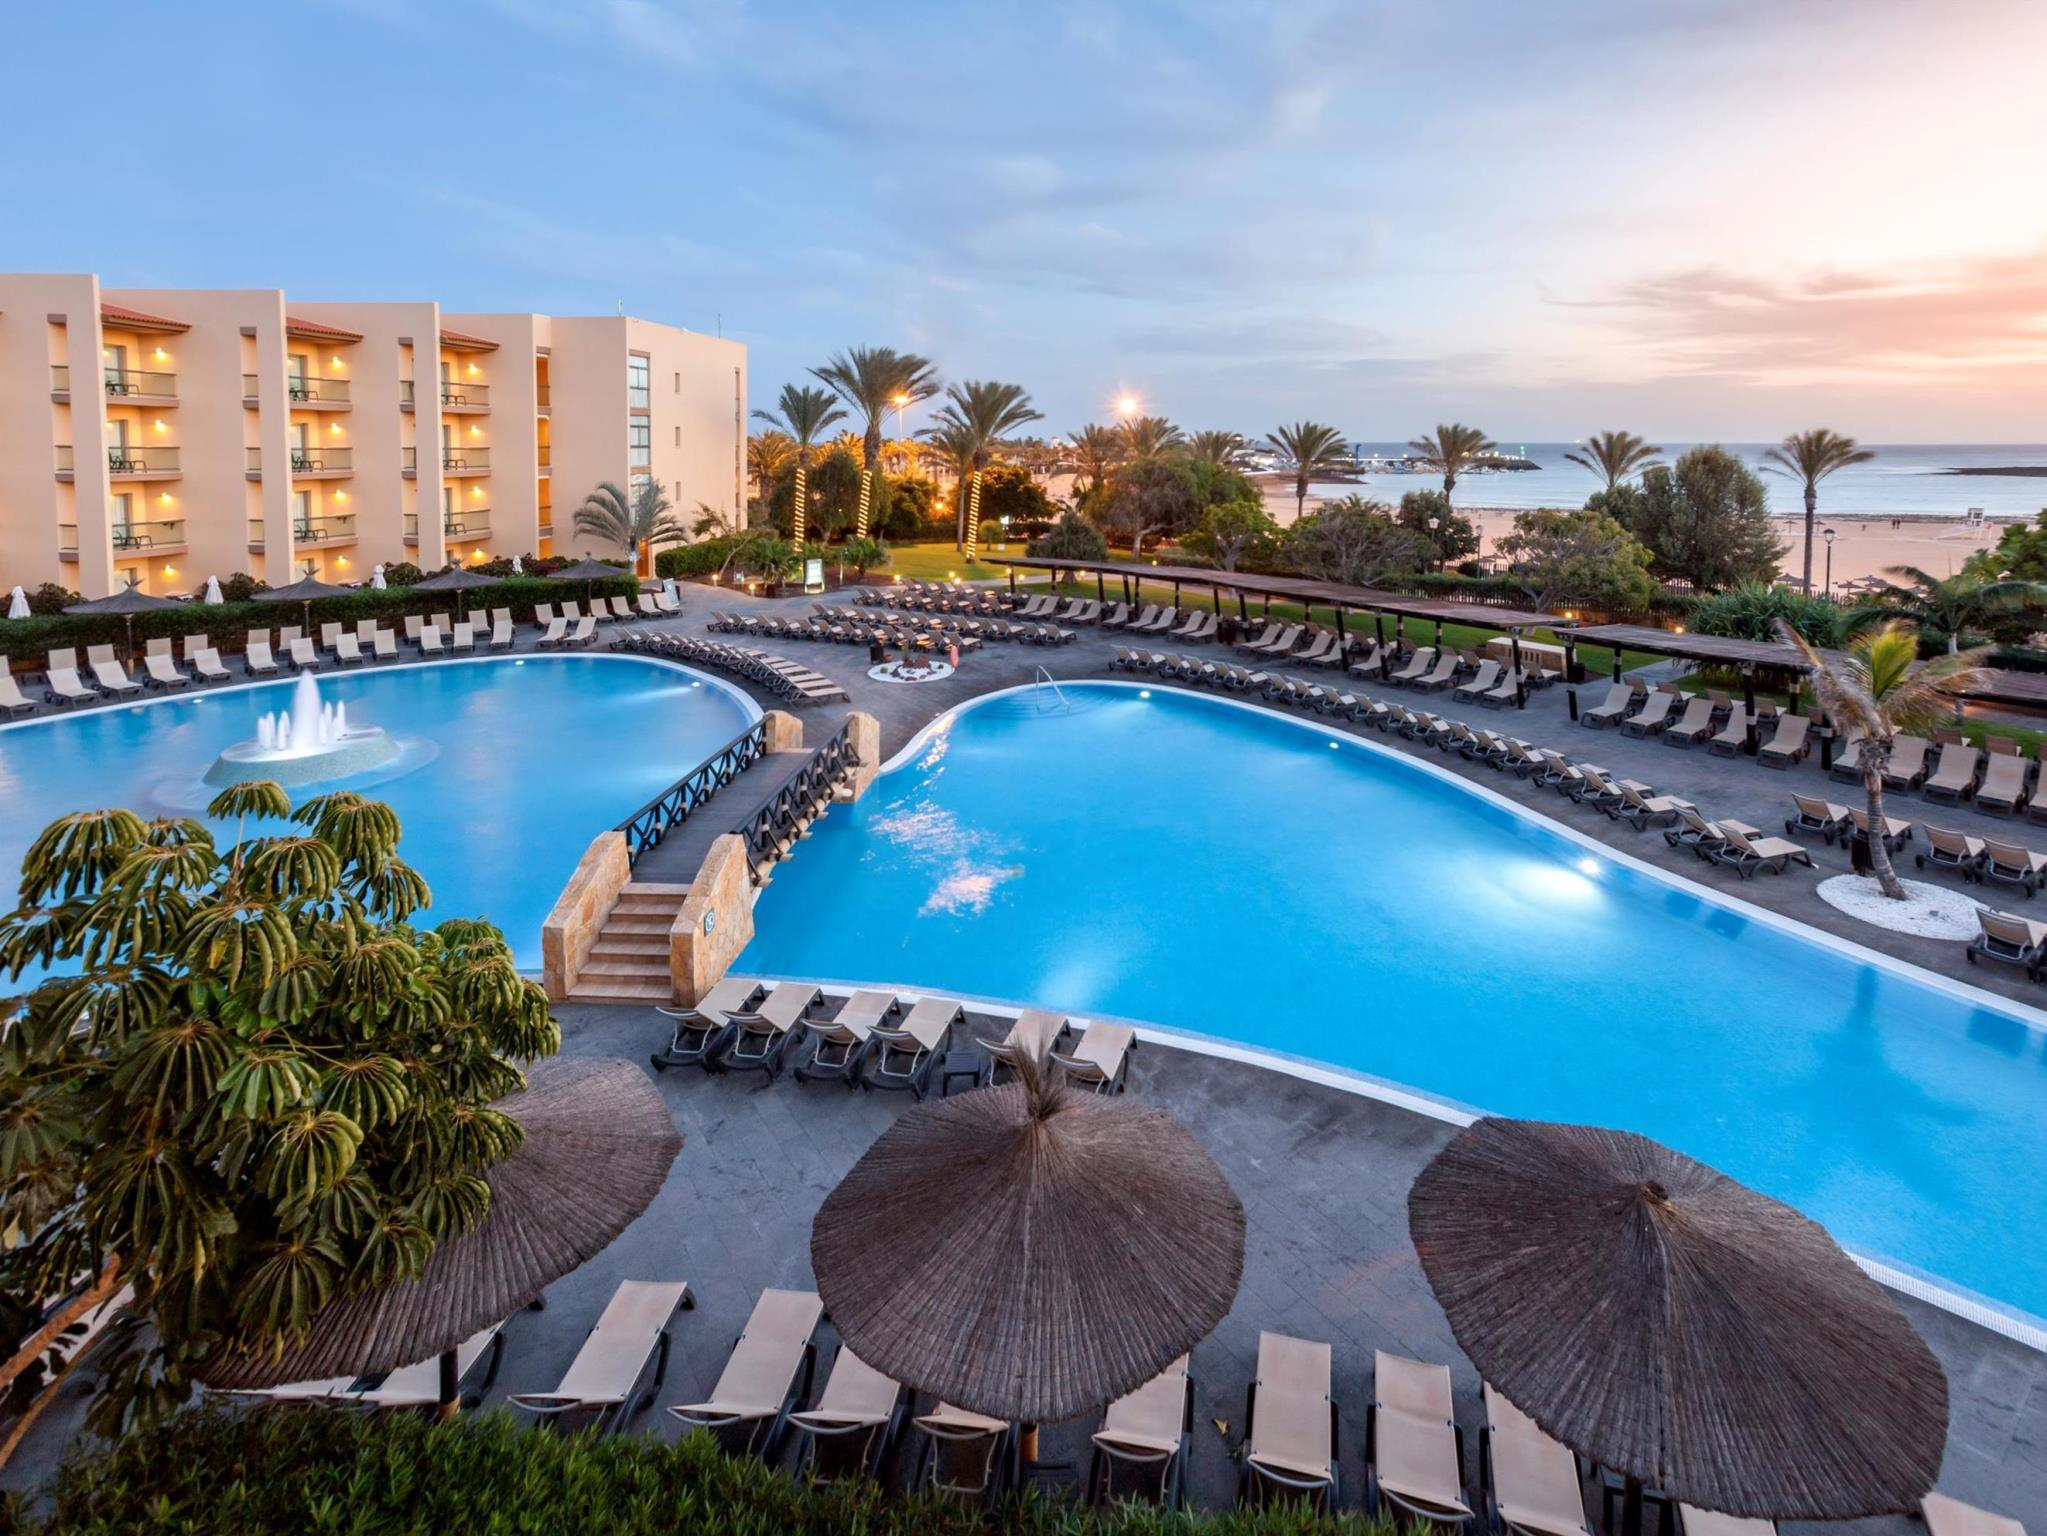 barcelo fuerteventura thalasso spa hotel spain from 83 save rh agoda com